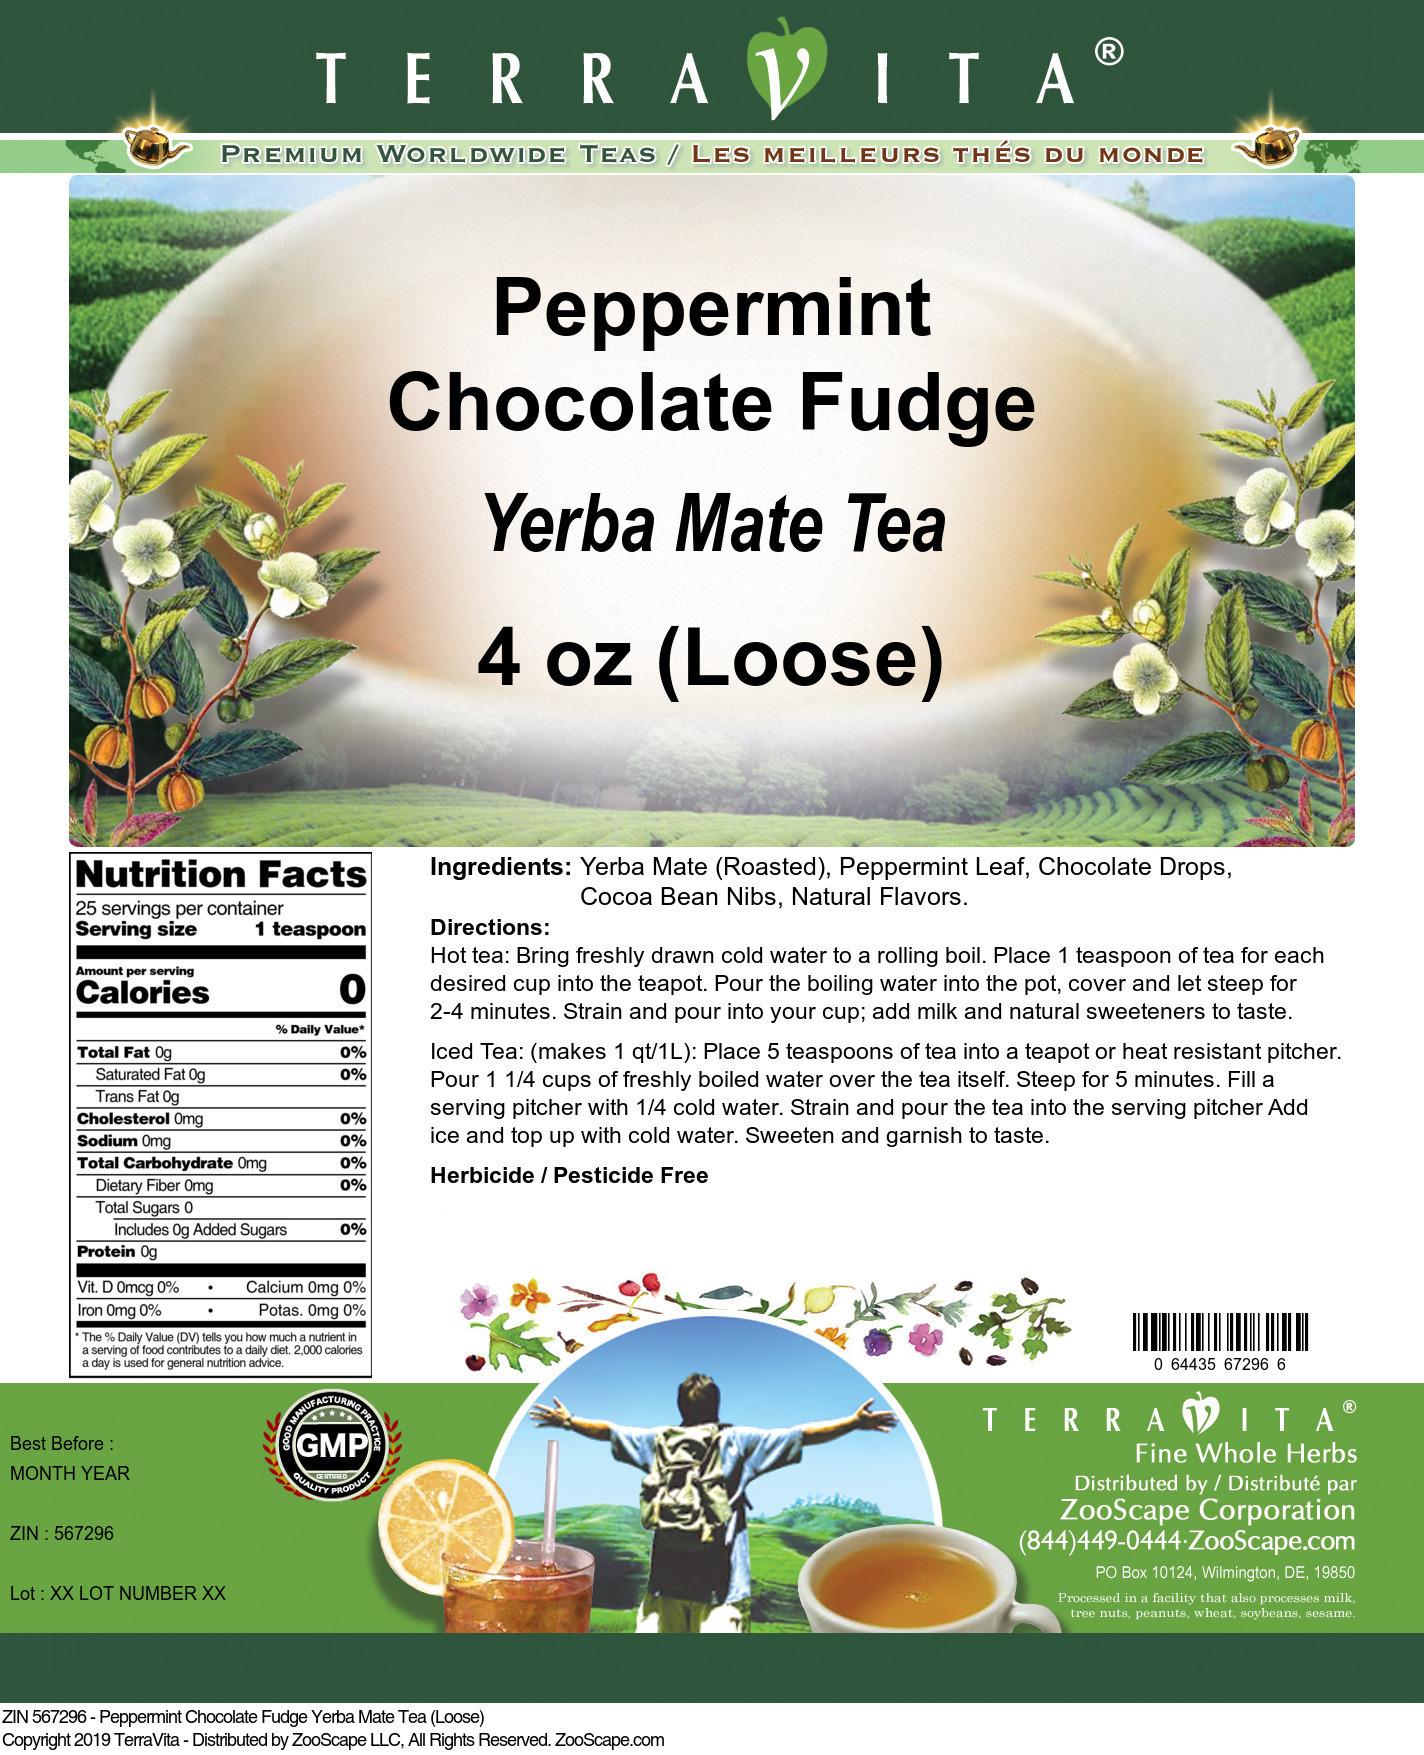 Peppermint Chocolate Fudge Yerba Mate